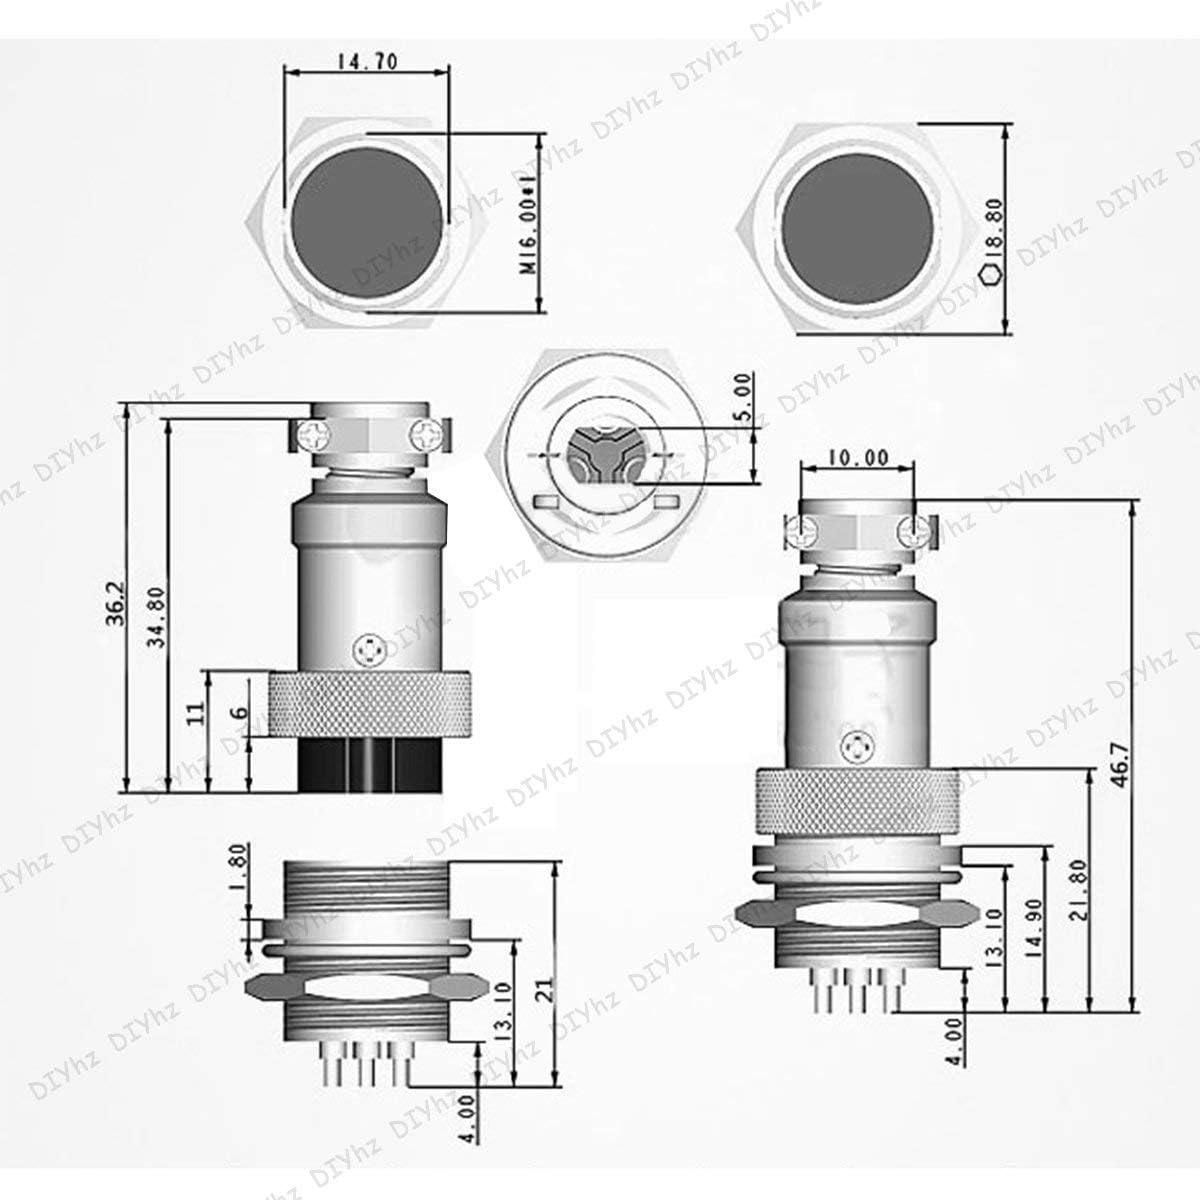 DIYhz GX16 9 Pins Panel Metal Mount Circular Metal Aviation Connector Adapter Male Female Plug Socket 5 Pcs